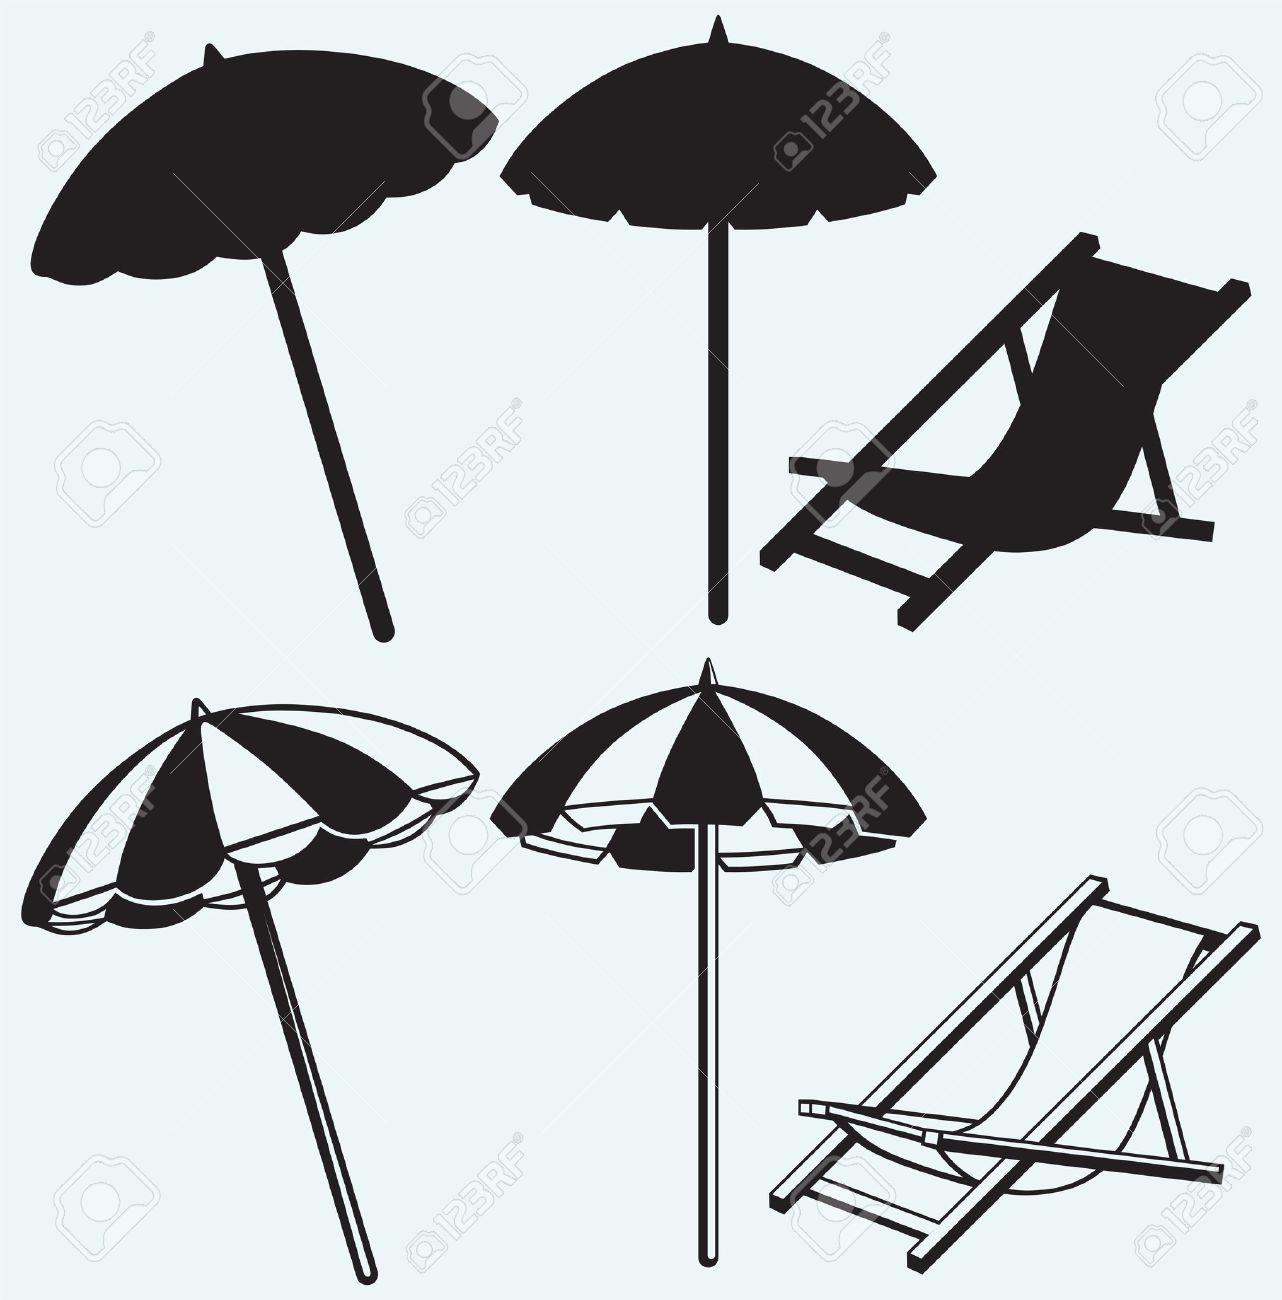 beach chair and umbrella clipart 20 free Cliparts ...